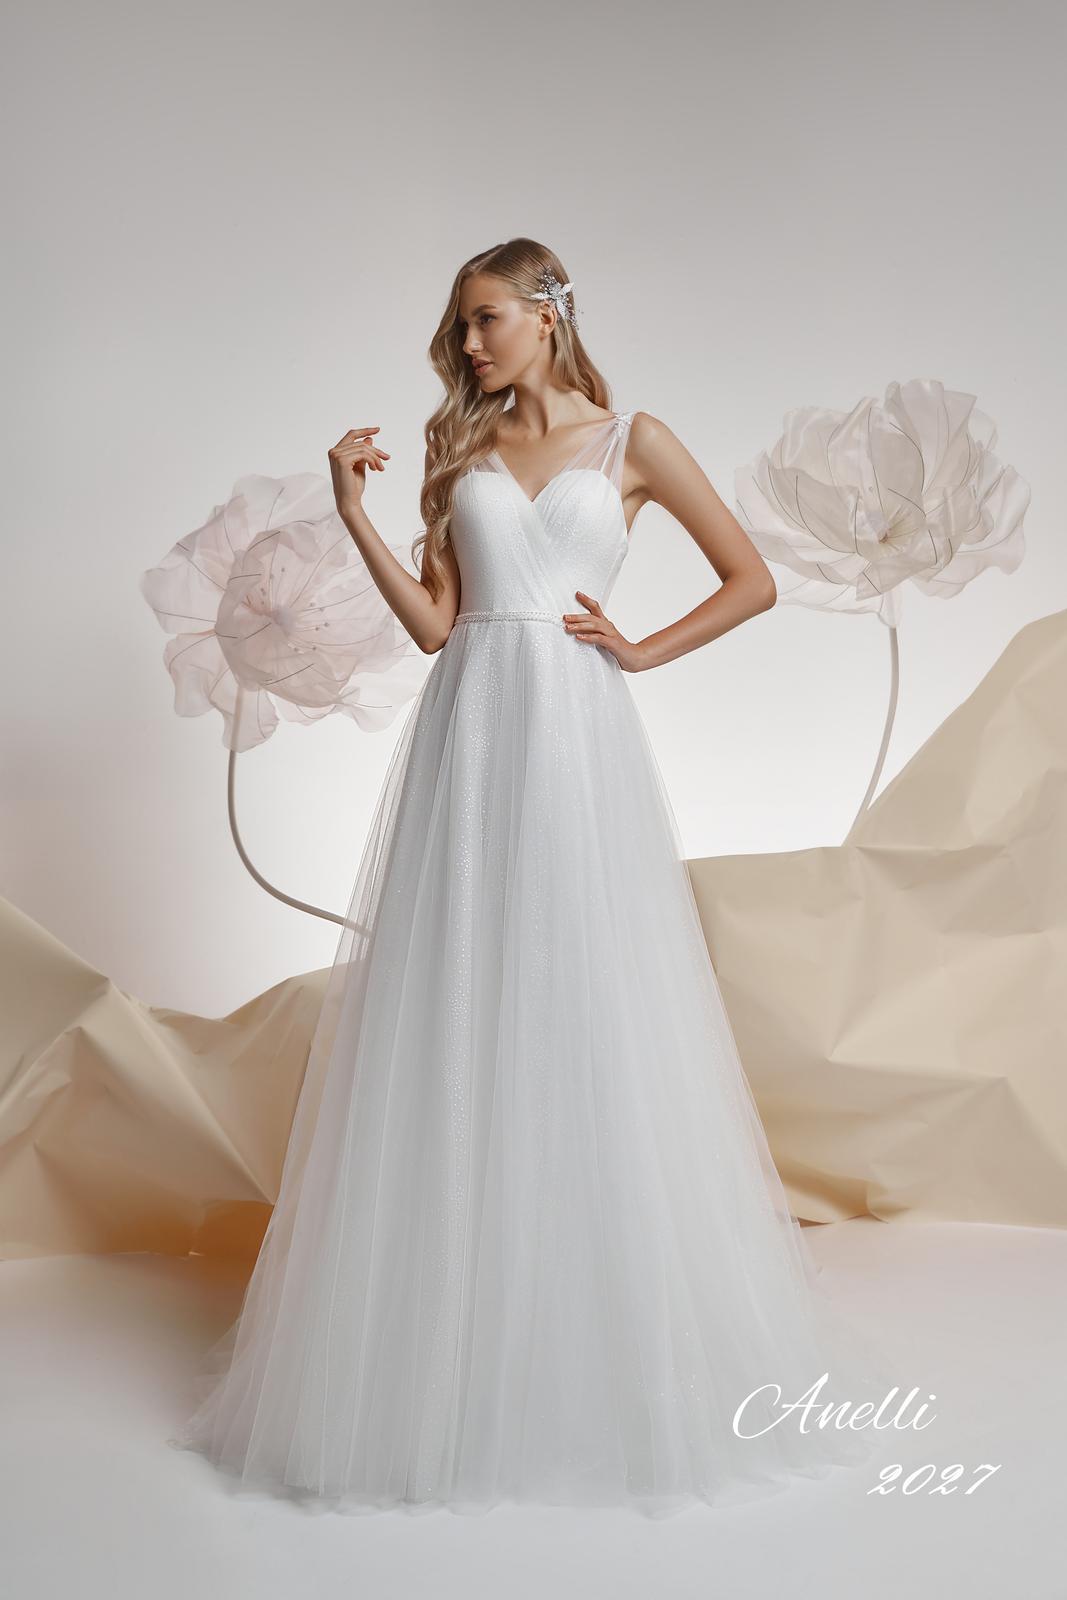 Svadobné šaty - Imagine 2027 - Obrázok č. 1